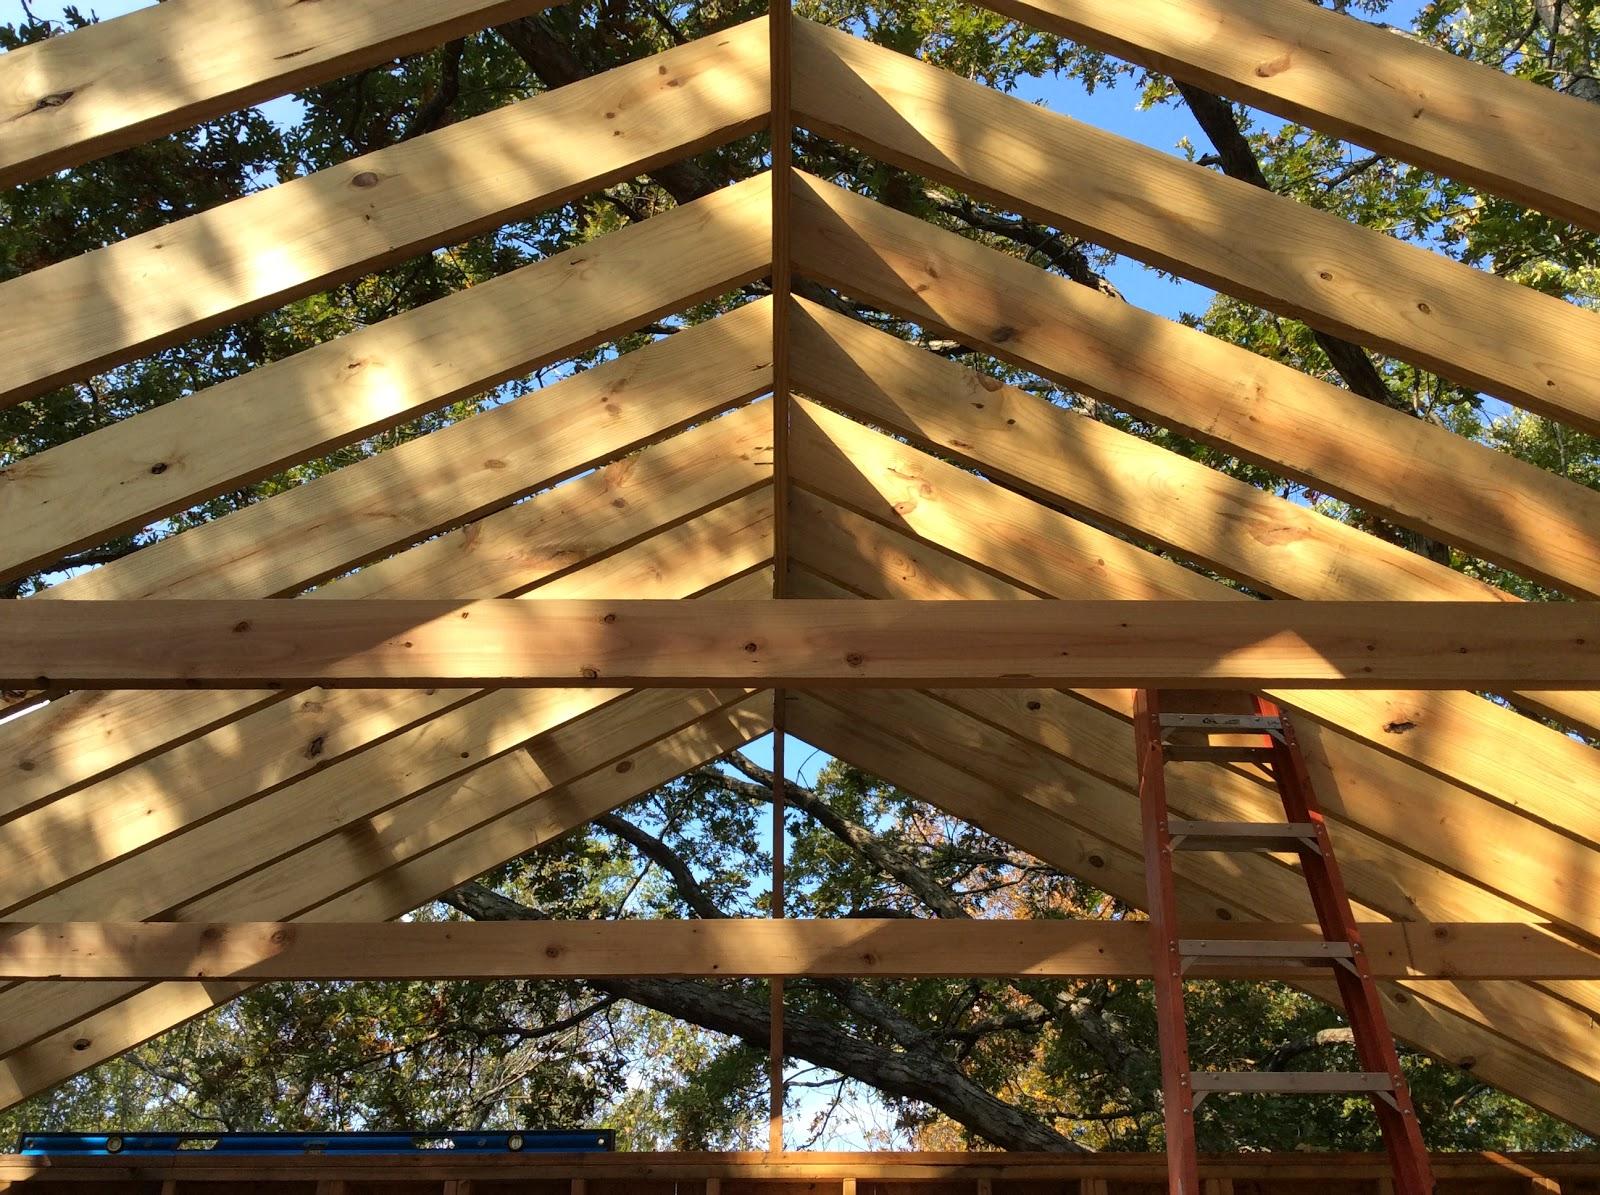 ozarks crescent mural cathedral ceiling rafters. Black Bedroom Furniture Sets. Home Design Ideas